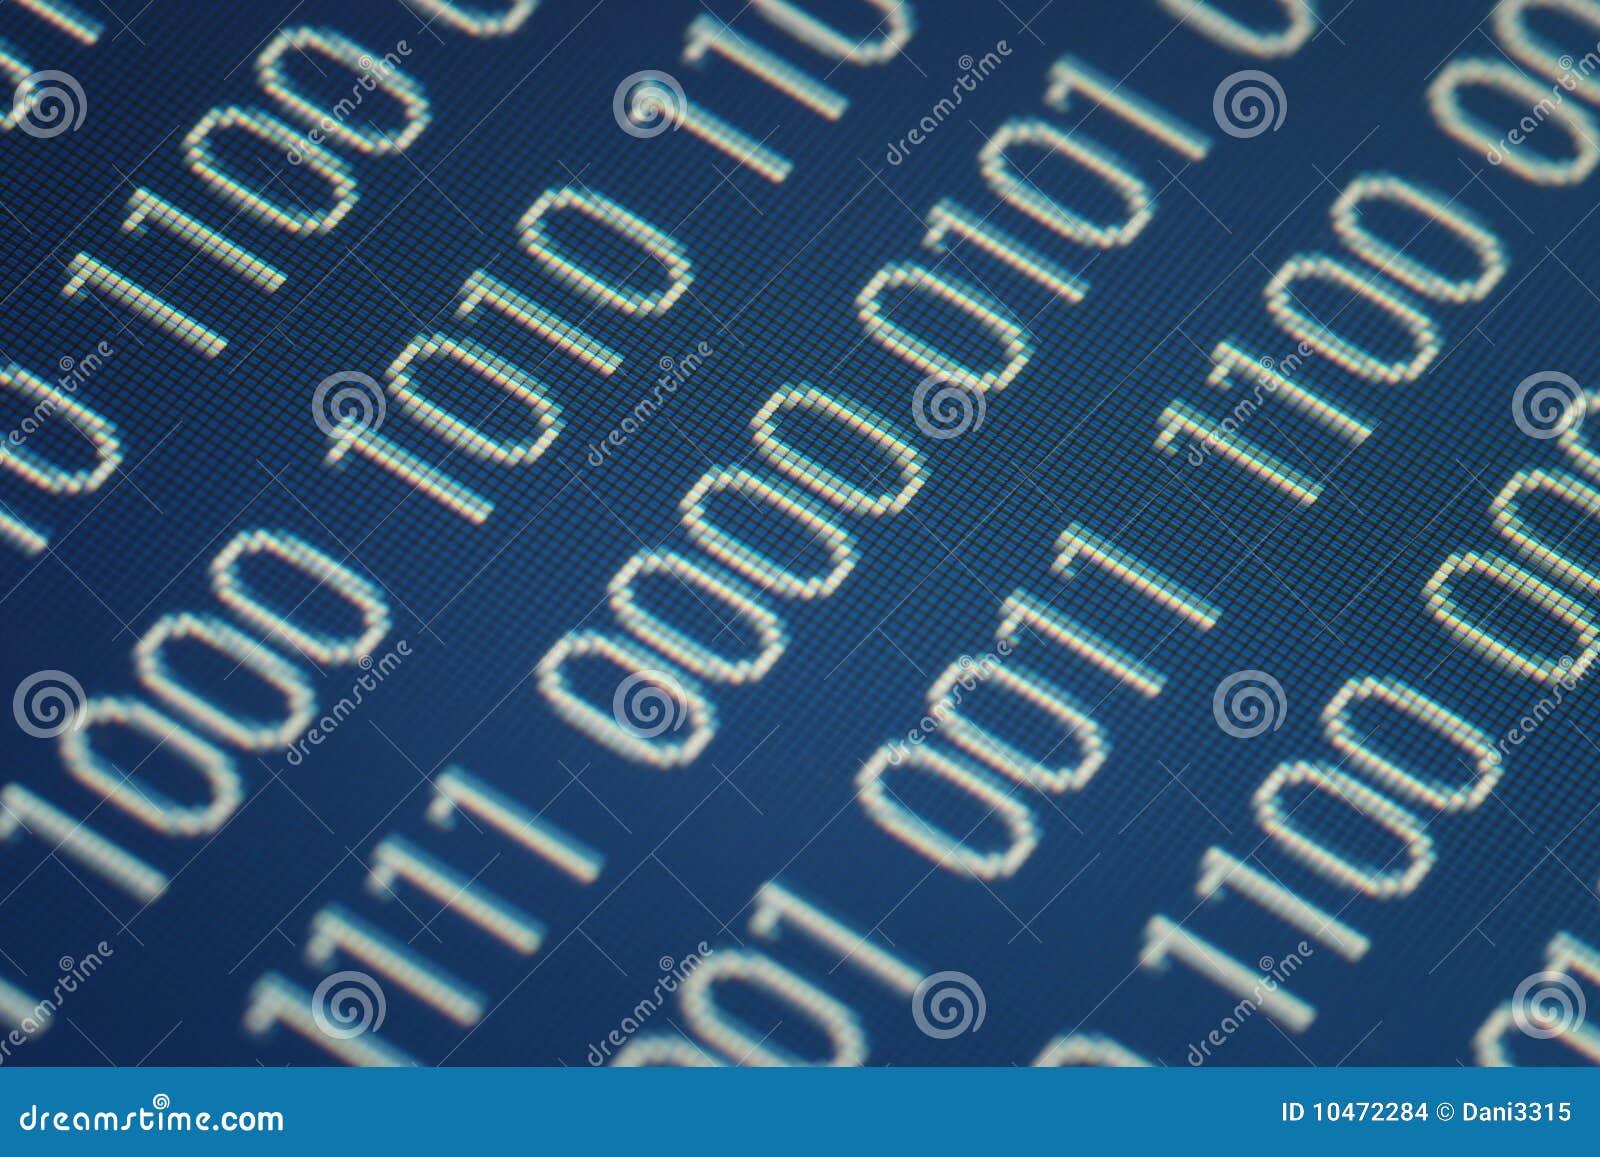 Ciérrese para arriba de código binario